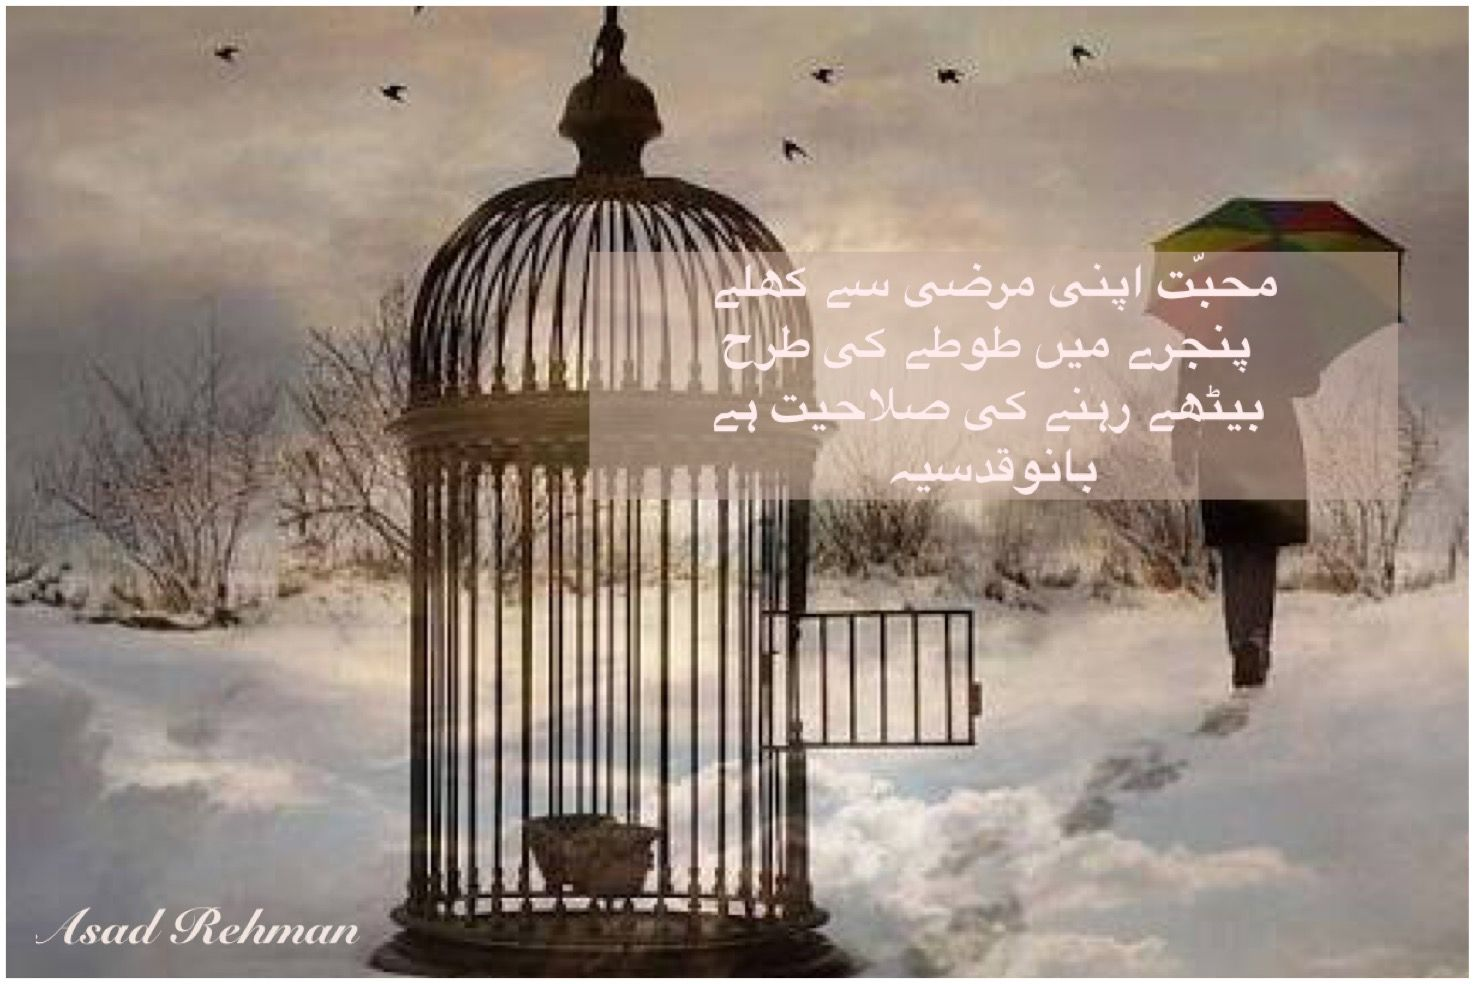 Bano qudsiya saying about mohabbat pakistan social web for Bano qudsia sayings